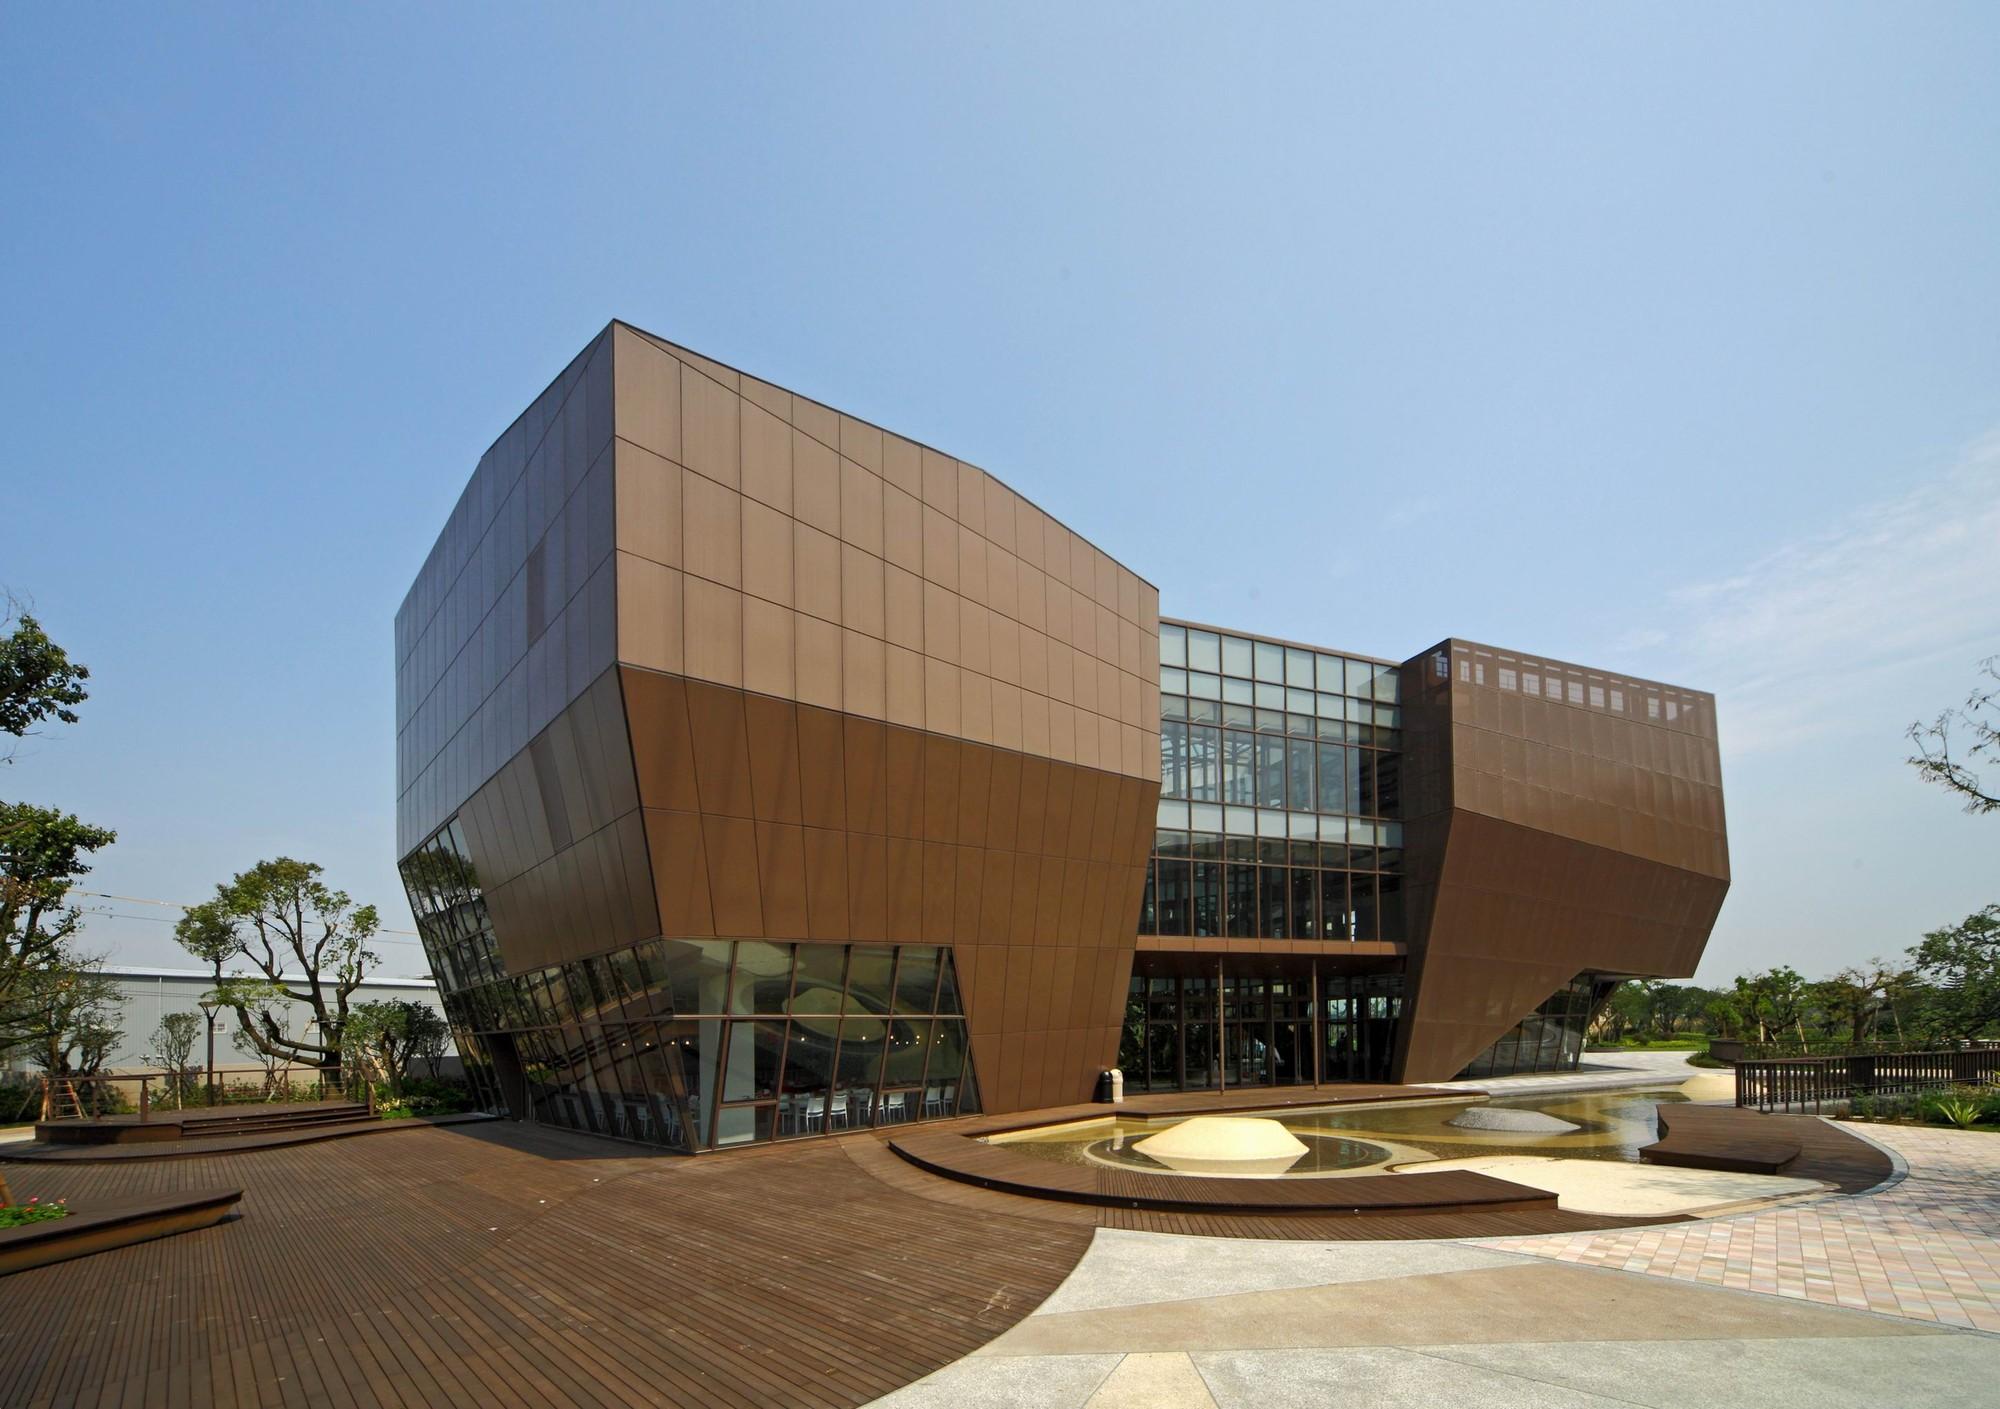 Museo del Chocolate Hunya / JJPan, © Vesper W. S. Hsieh